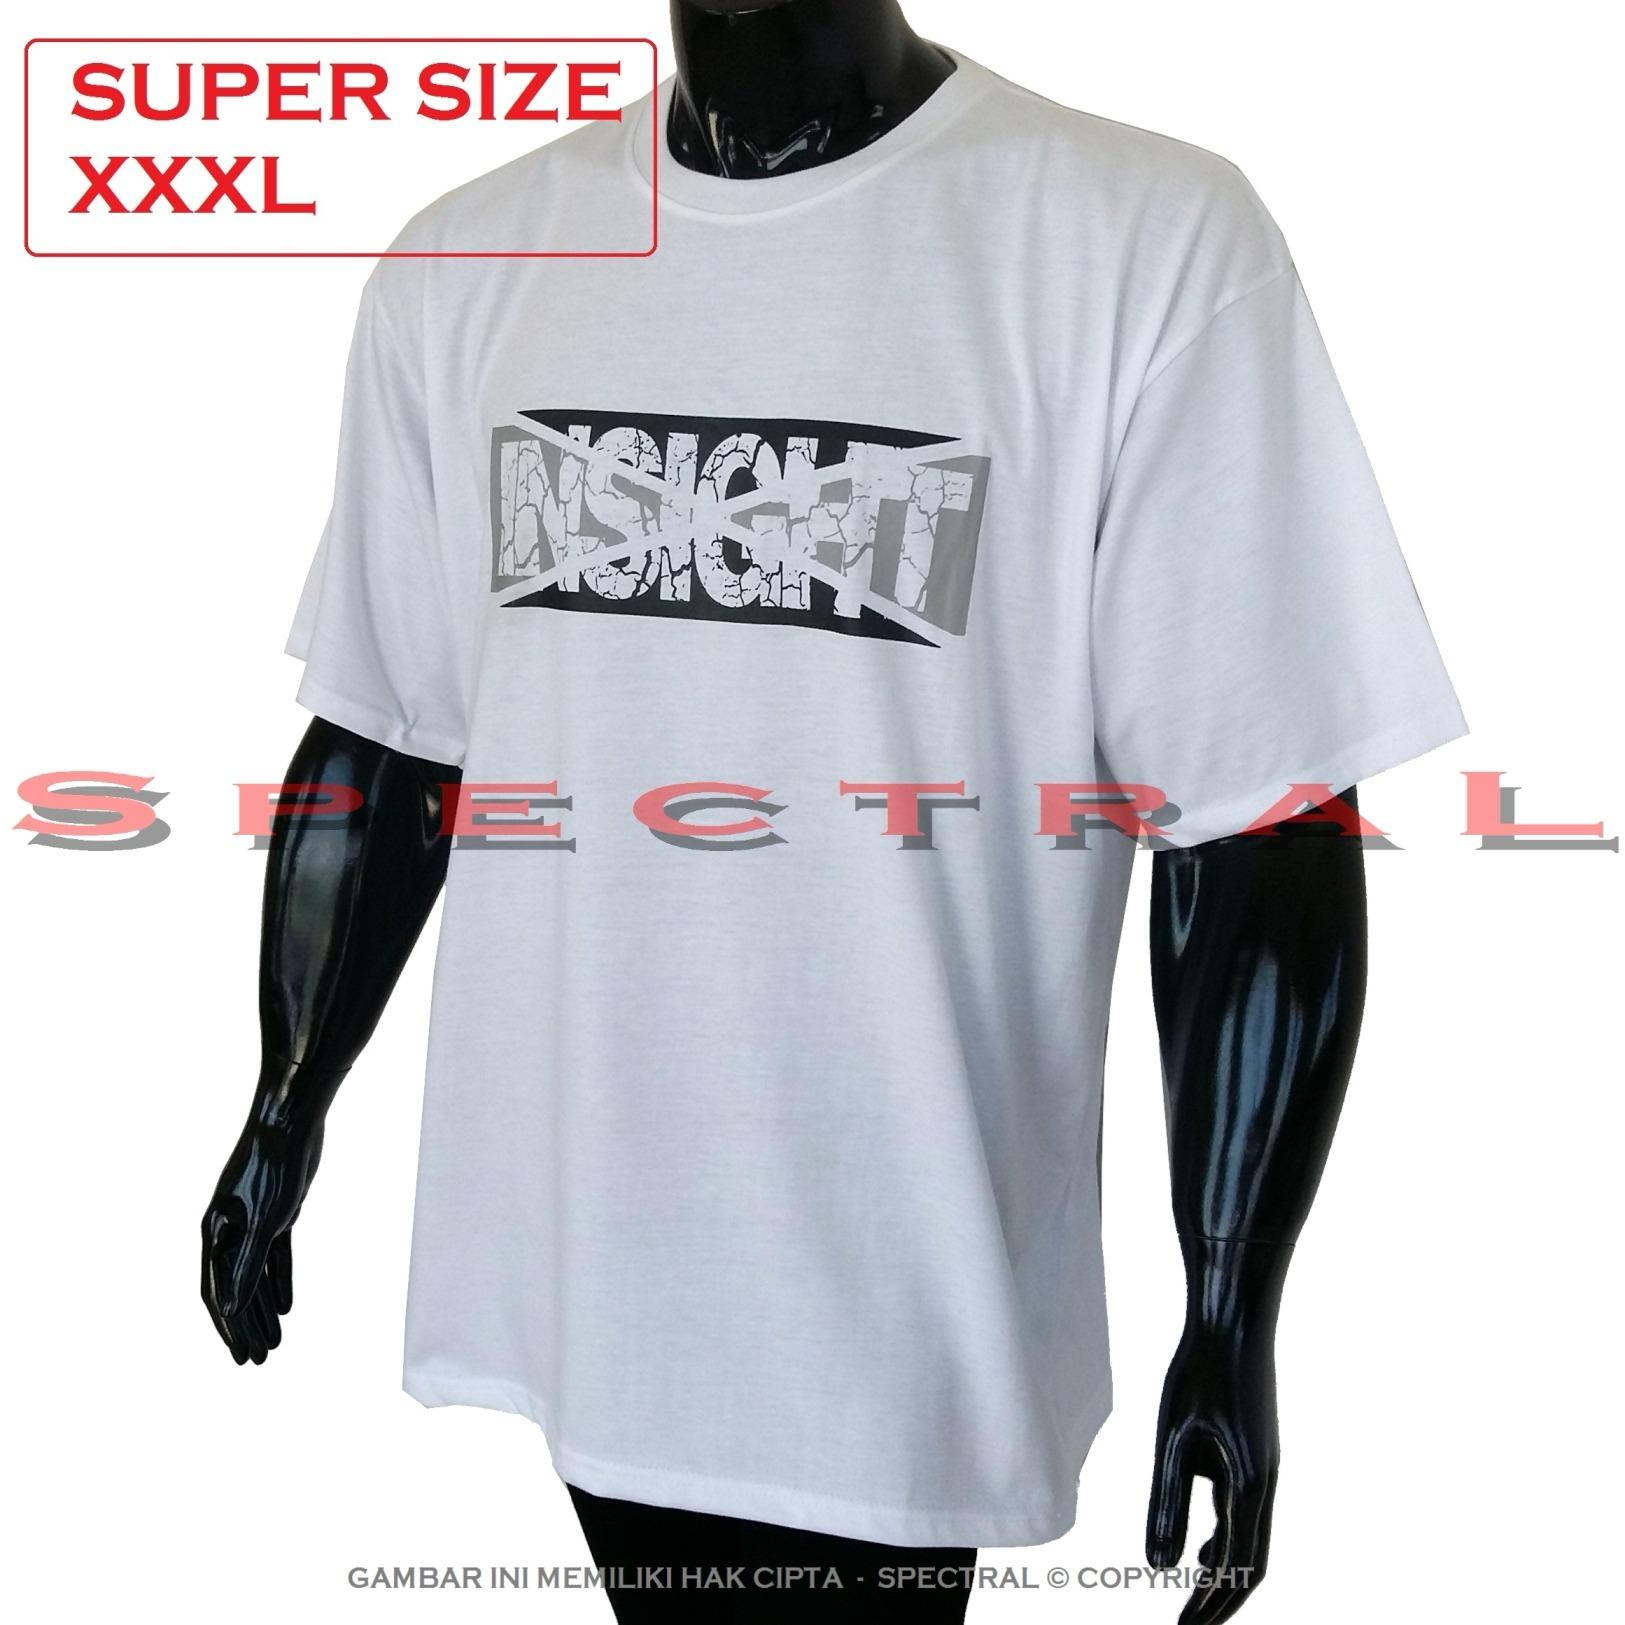 Spectral – 3XL SUPER BIG SIZE XXXL 100% Cotton Combed Kaos Distro Jumbo BIG T-Shirt Fashion Ukuran Besar Polos Celana Olahraga Atasan Pria Wanita Dewasa Bapak Orang Tua Muda  Gemuk Gendut Sport Casual Bagus Keren Baju Cowo Cewe Pakaian 3L INSIGHT RETAK